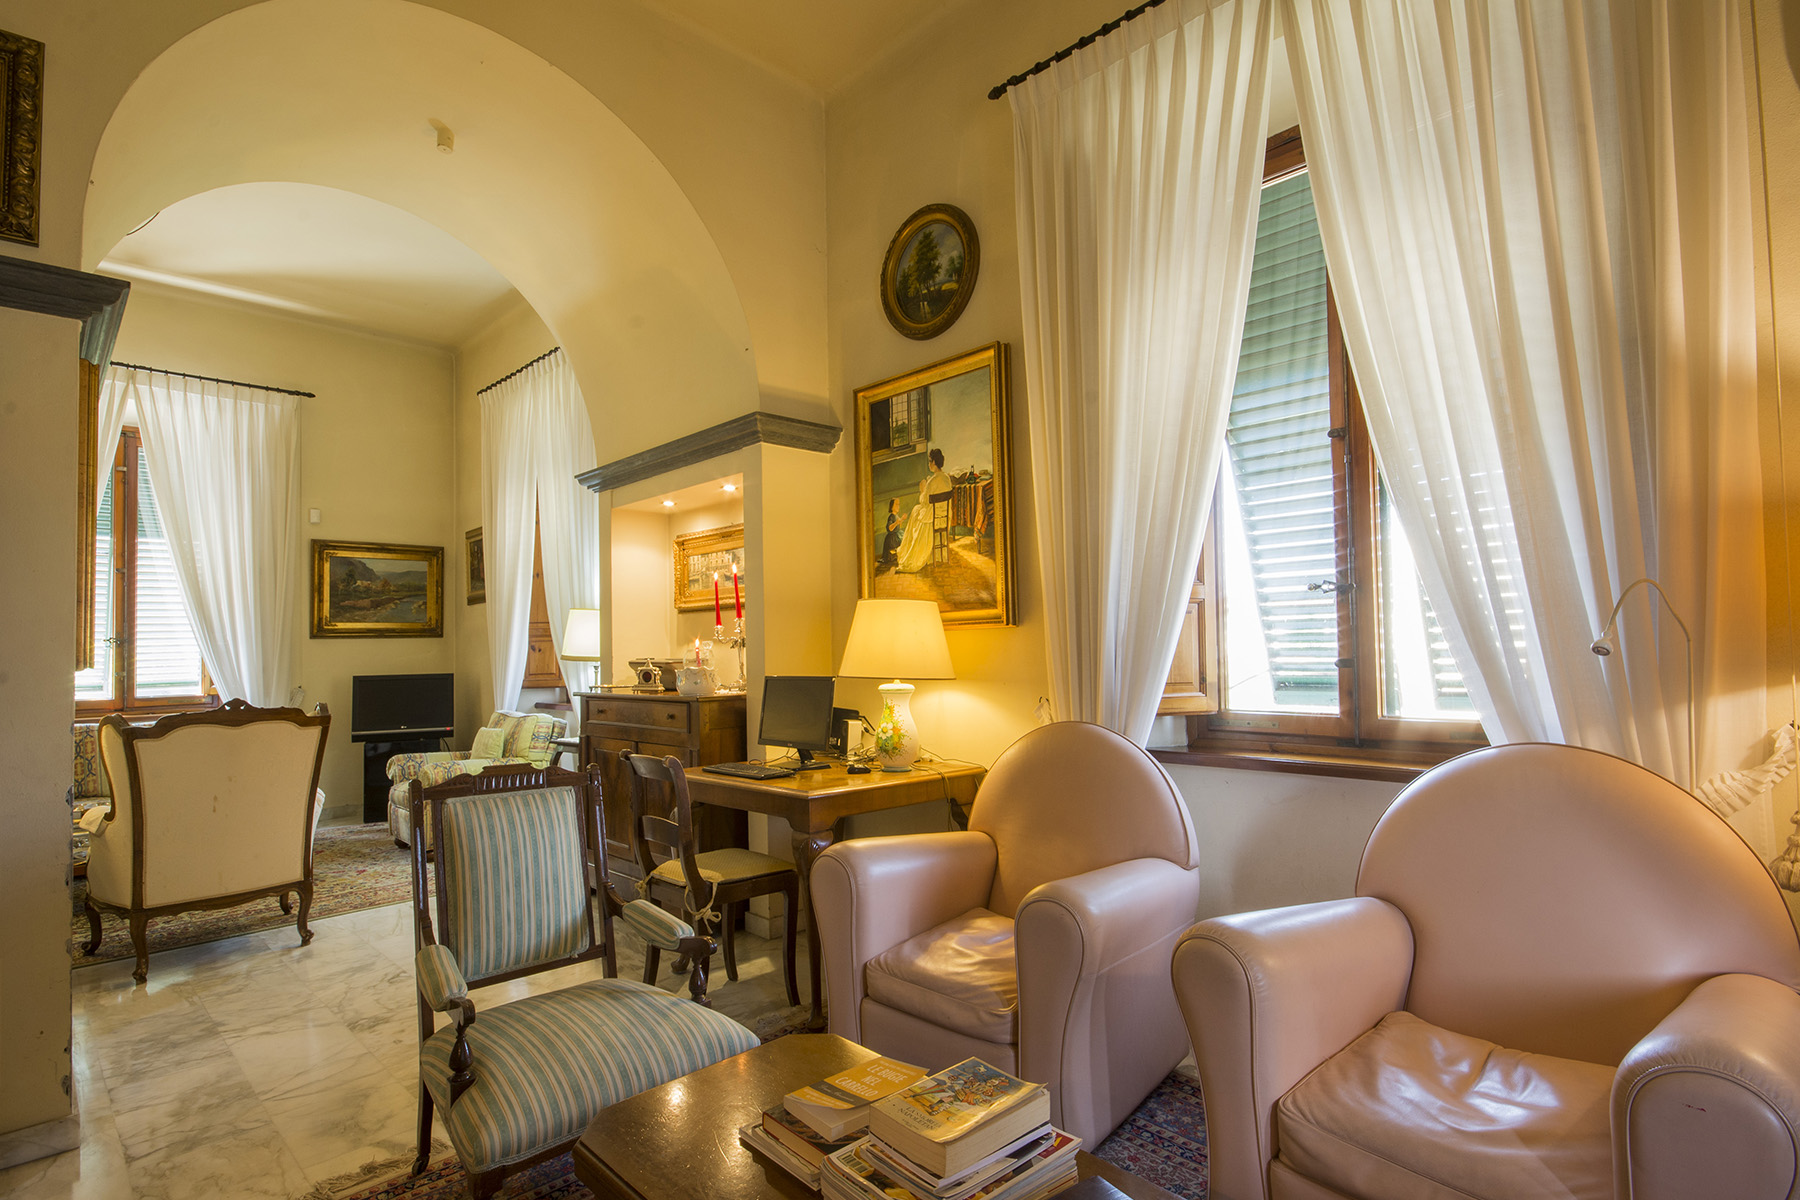 Villa in Vendita a Lucca: 5 locali, 500 mq - Foto 6